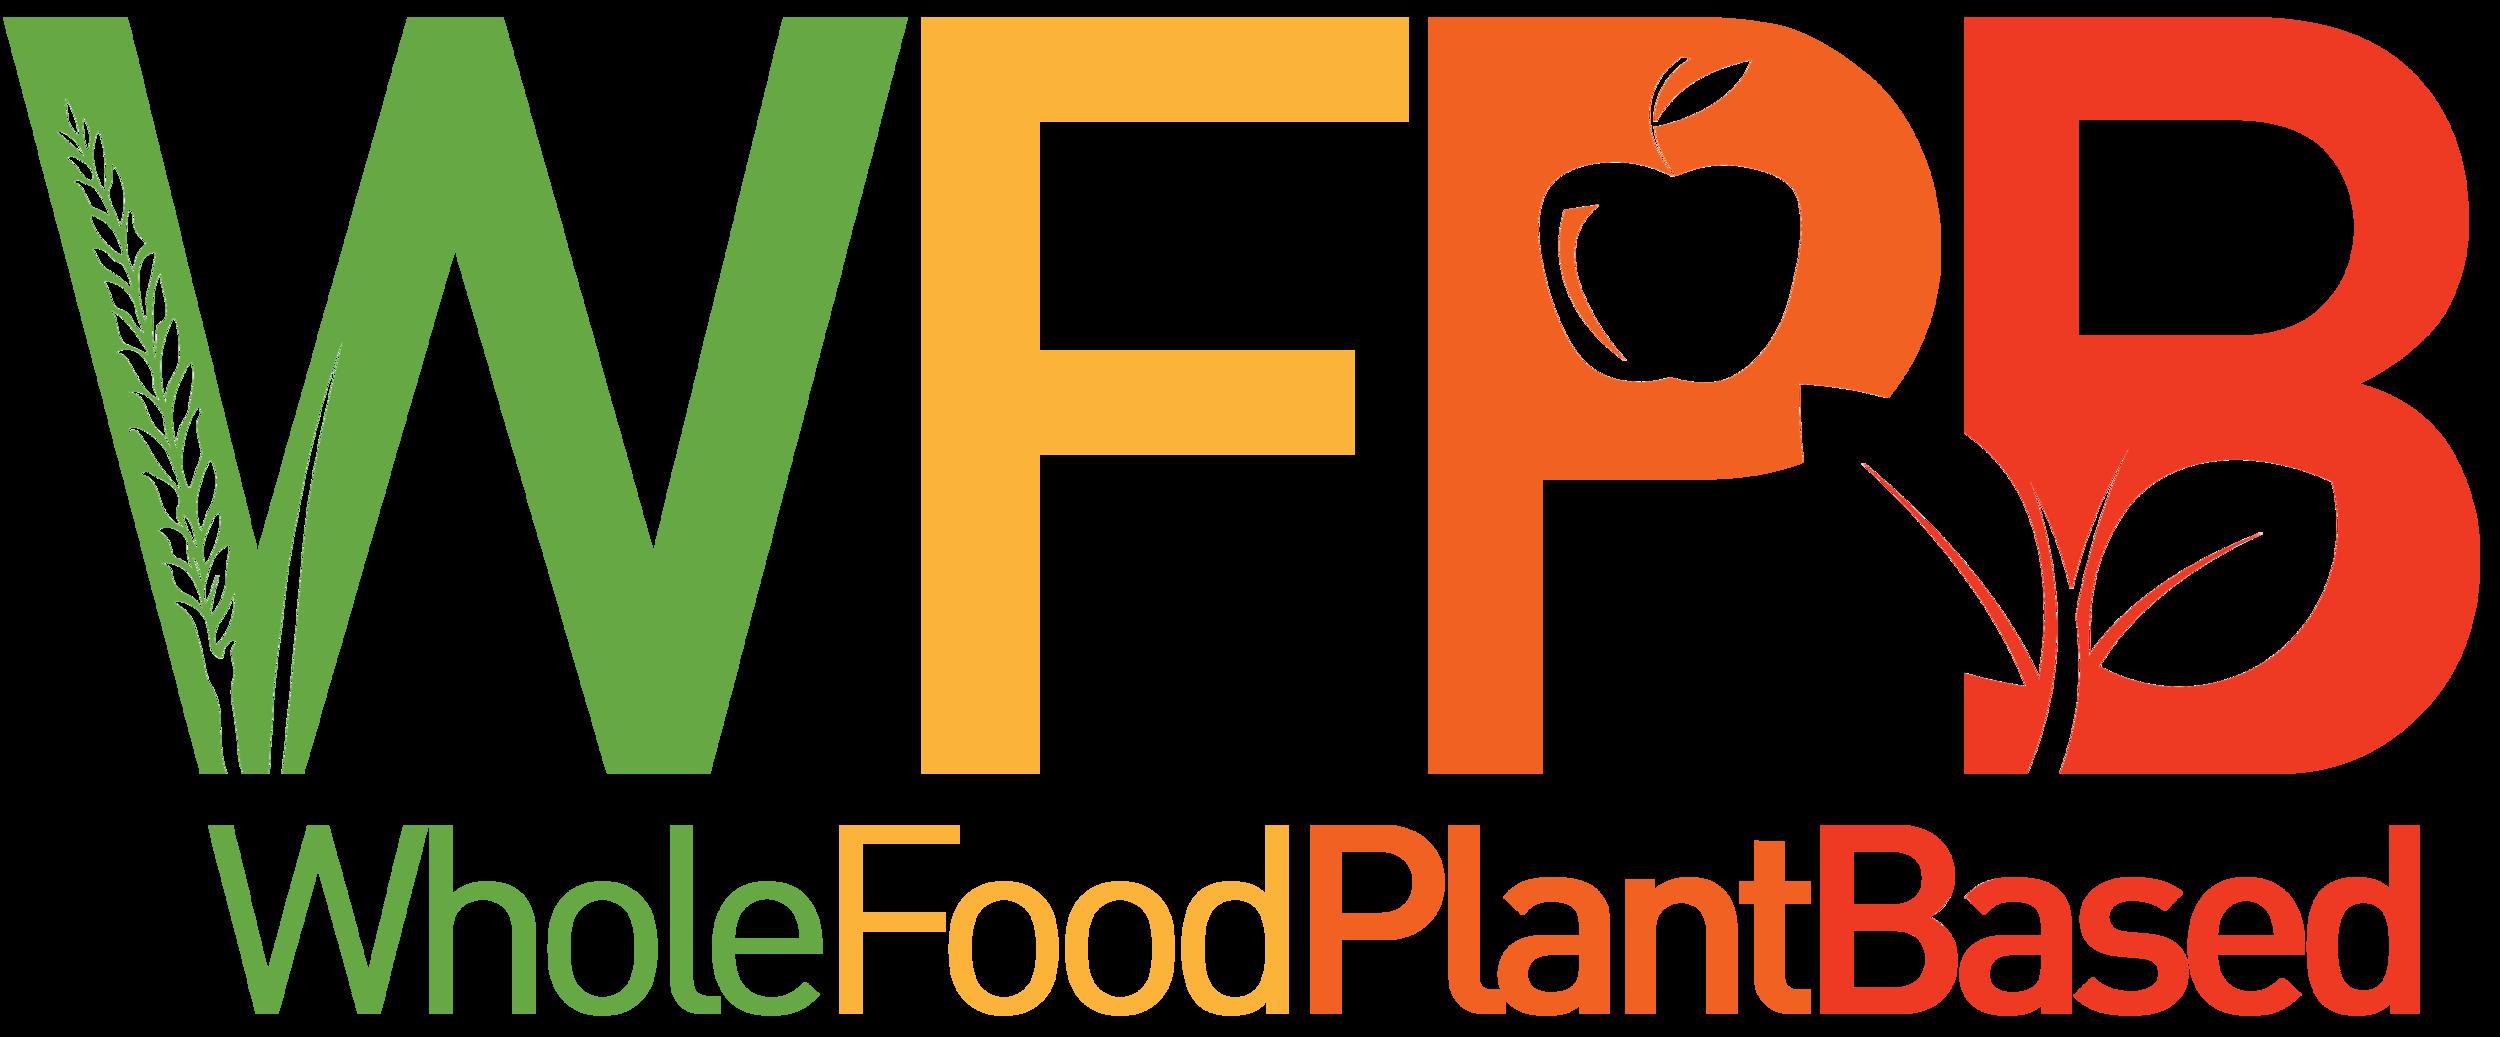 WFPB trademark-logo.png